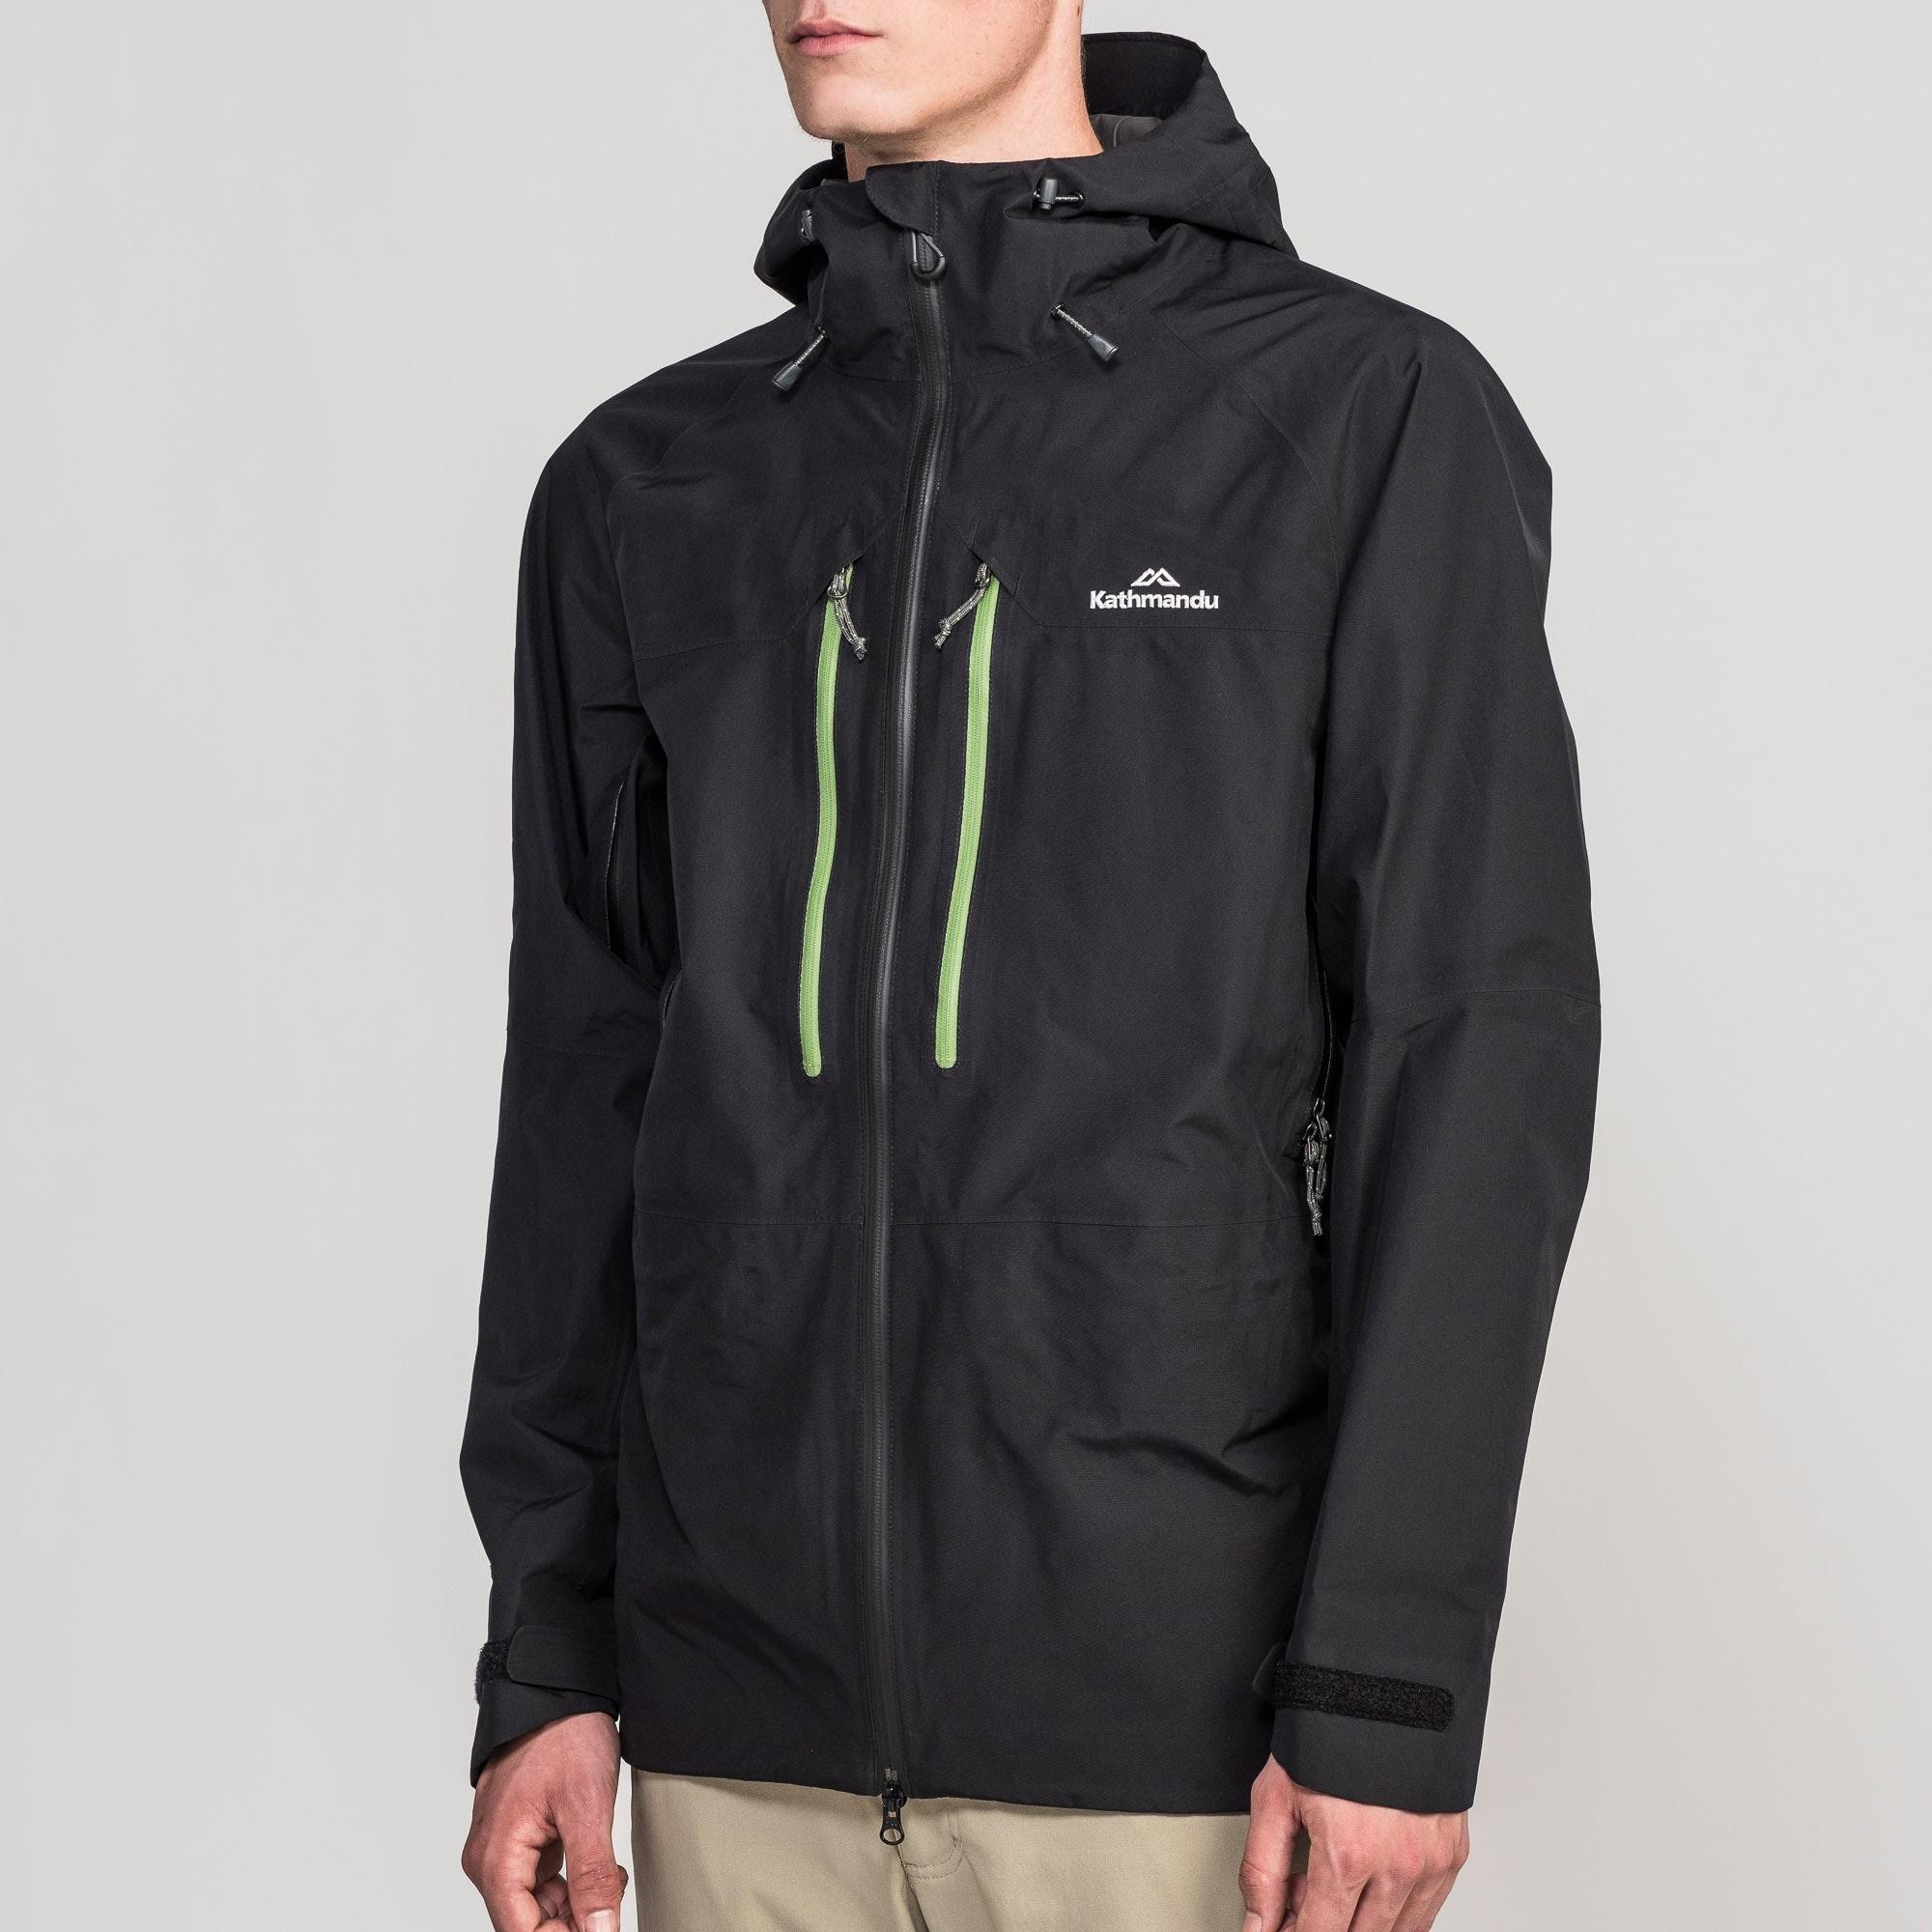 NEW-Kathmandu-Aysen-Men-039-s-GORE-TEX-Windproof-Waterproof-Outdoor-Rain-Jacket thumbnail 8